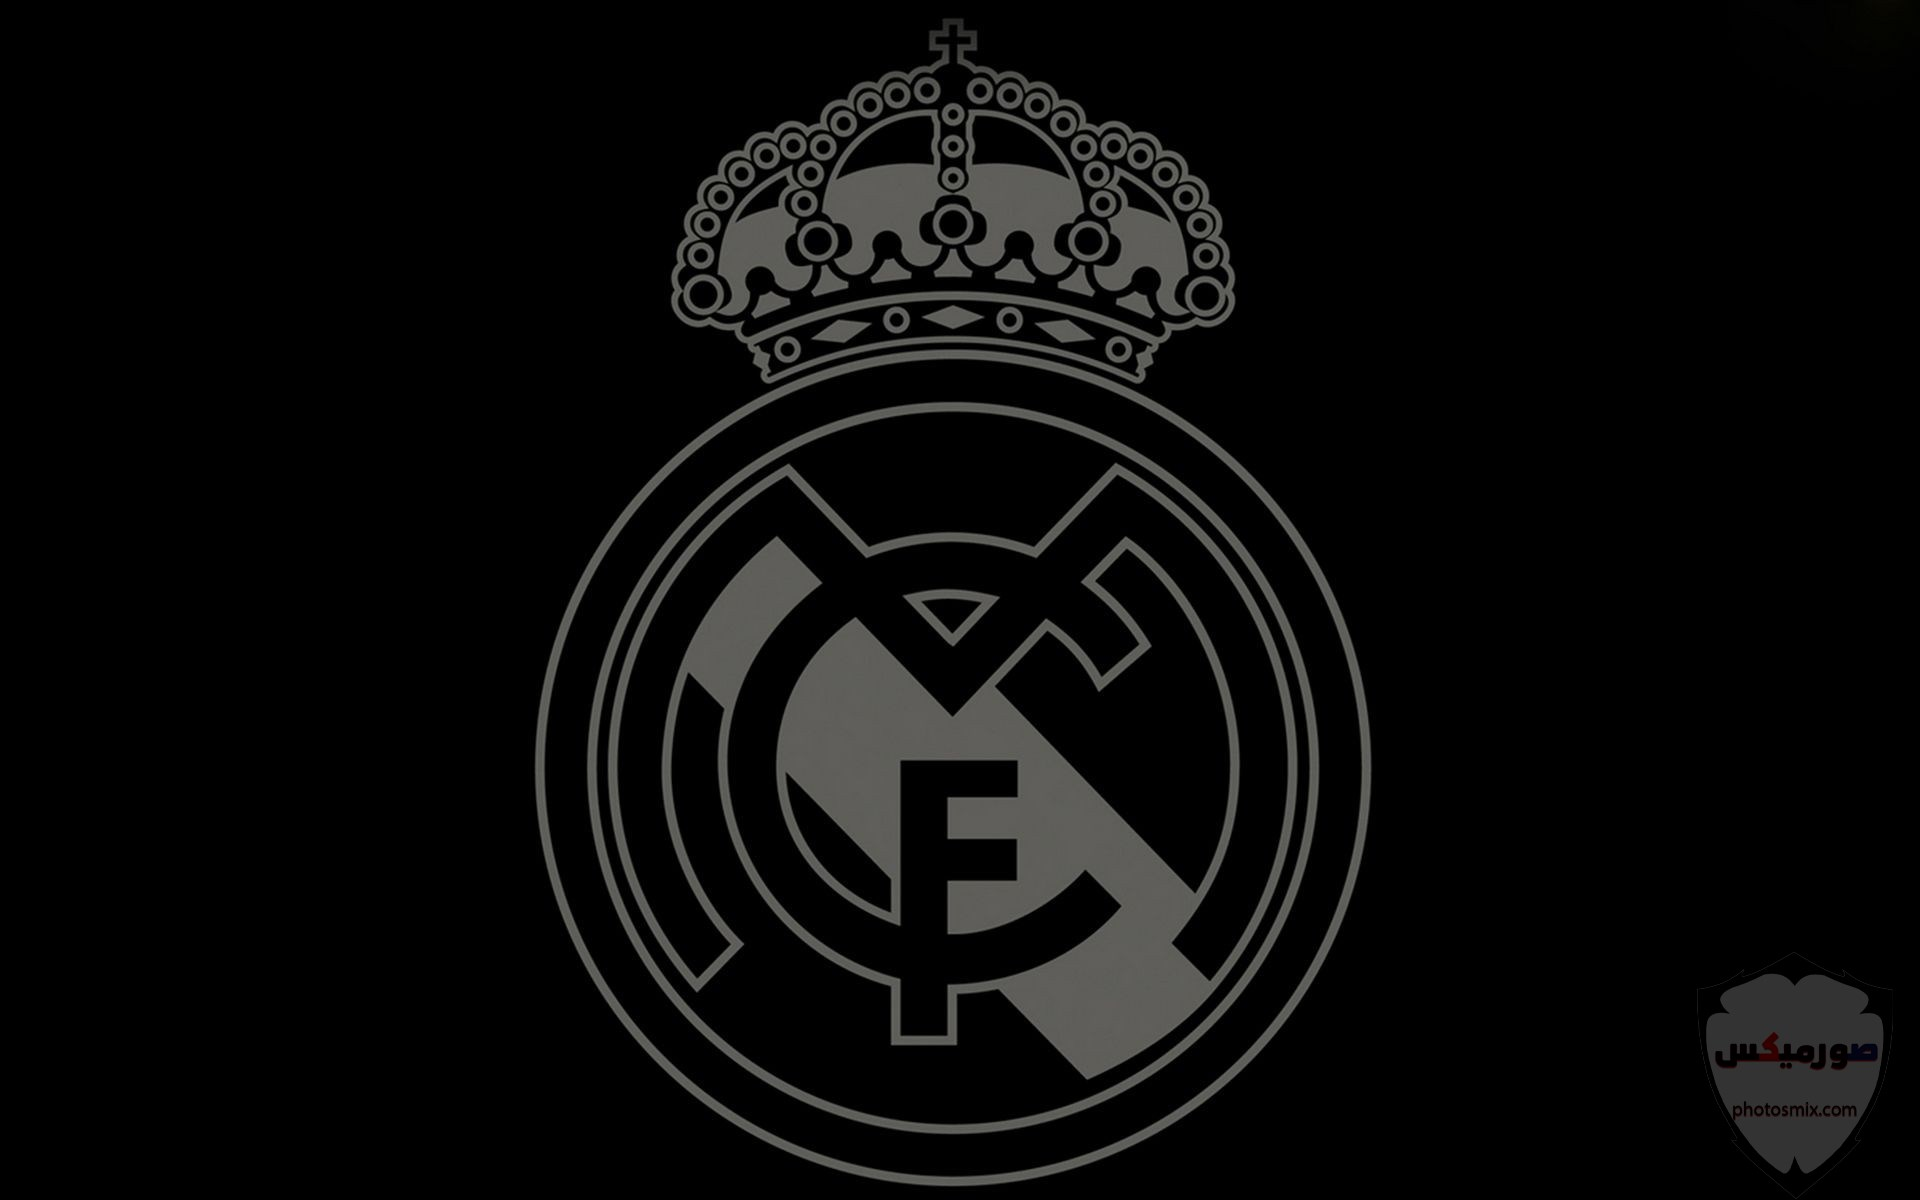 صور ريال مدريد 2020خلفيات ورمزيات ريال مدريد صور لاعبي ريال مدريد real madrid 26